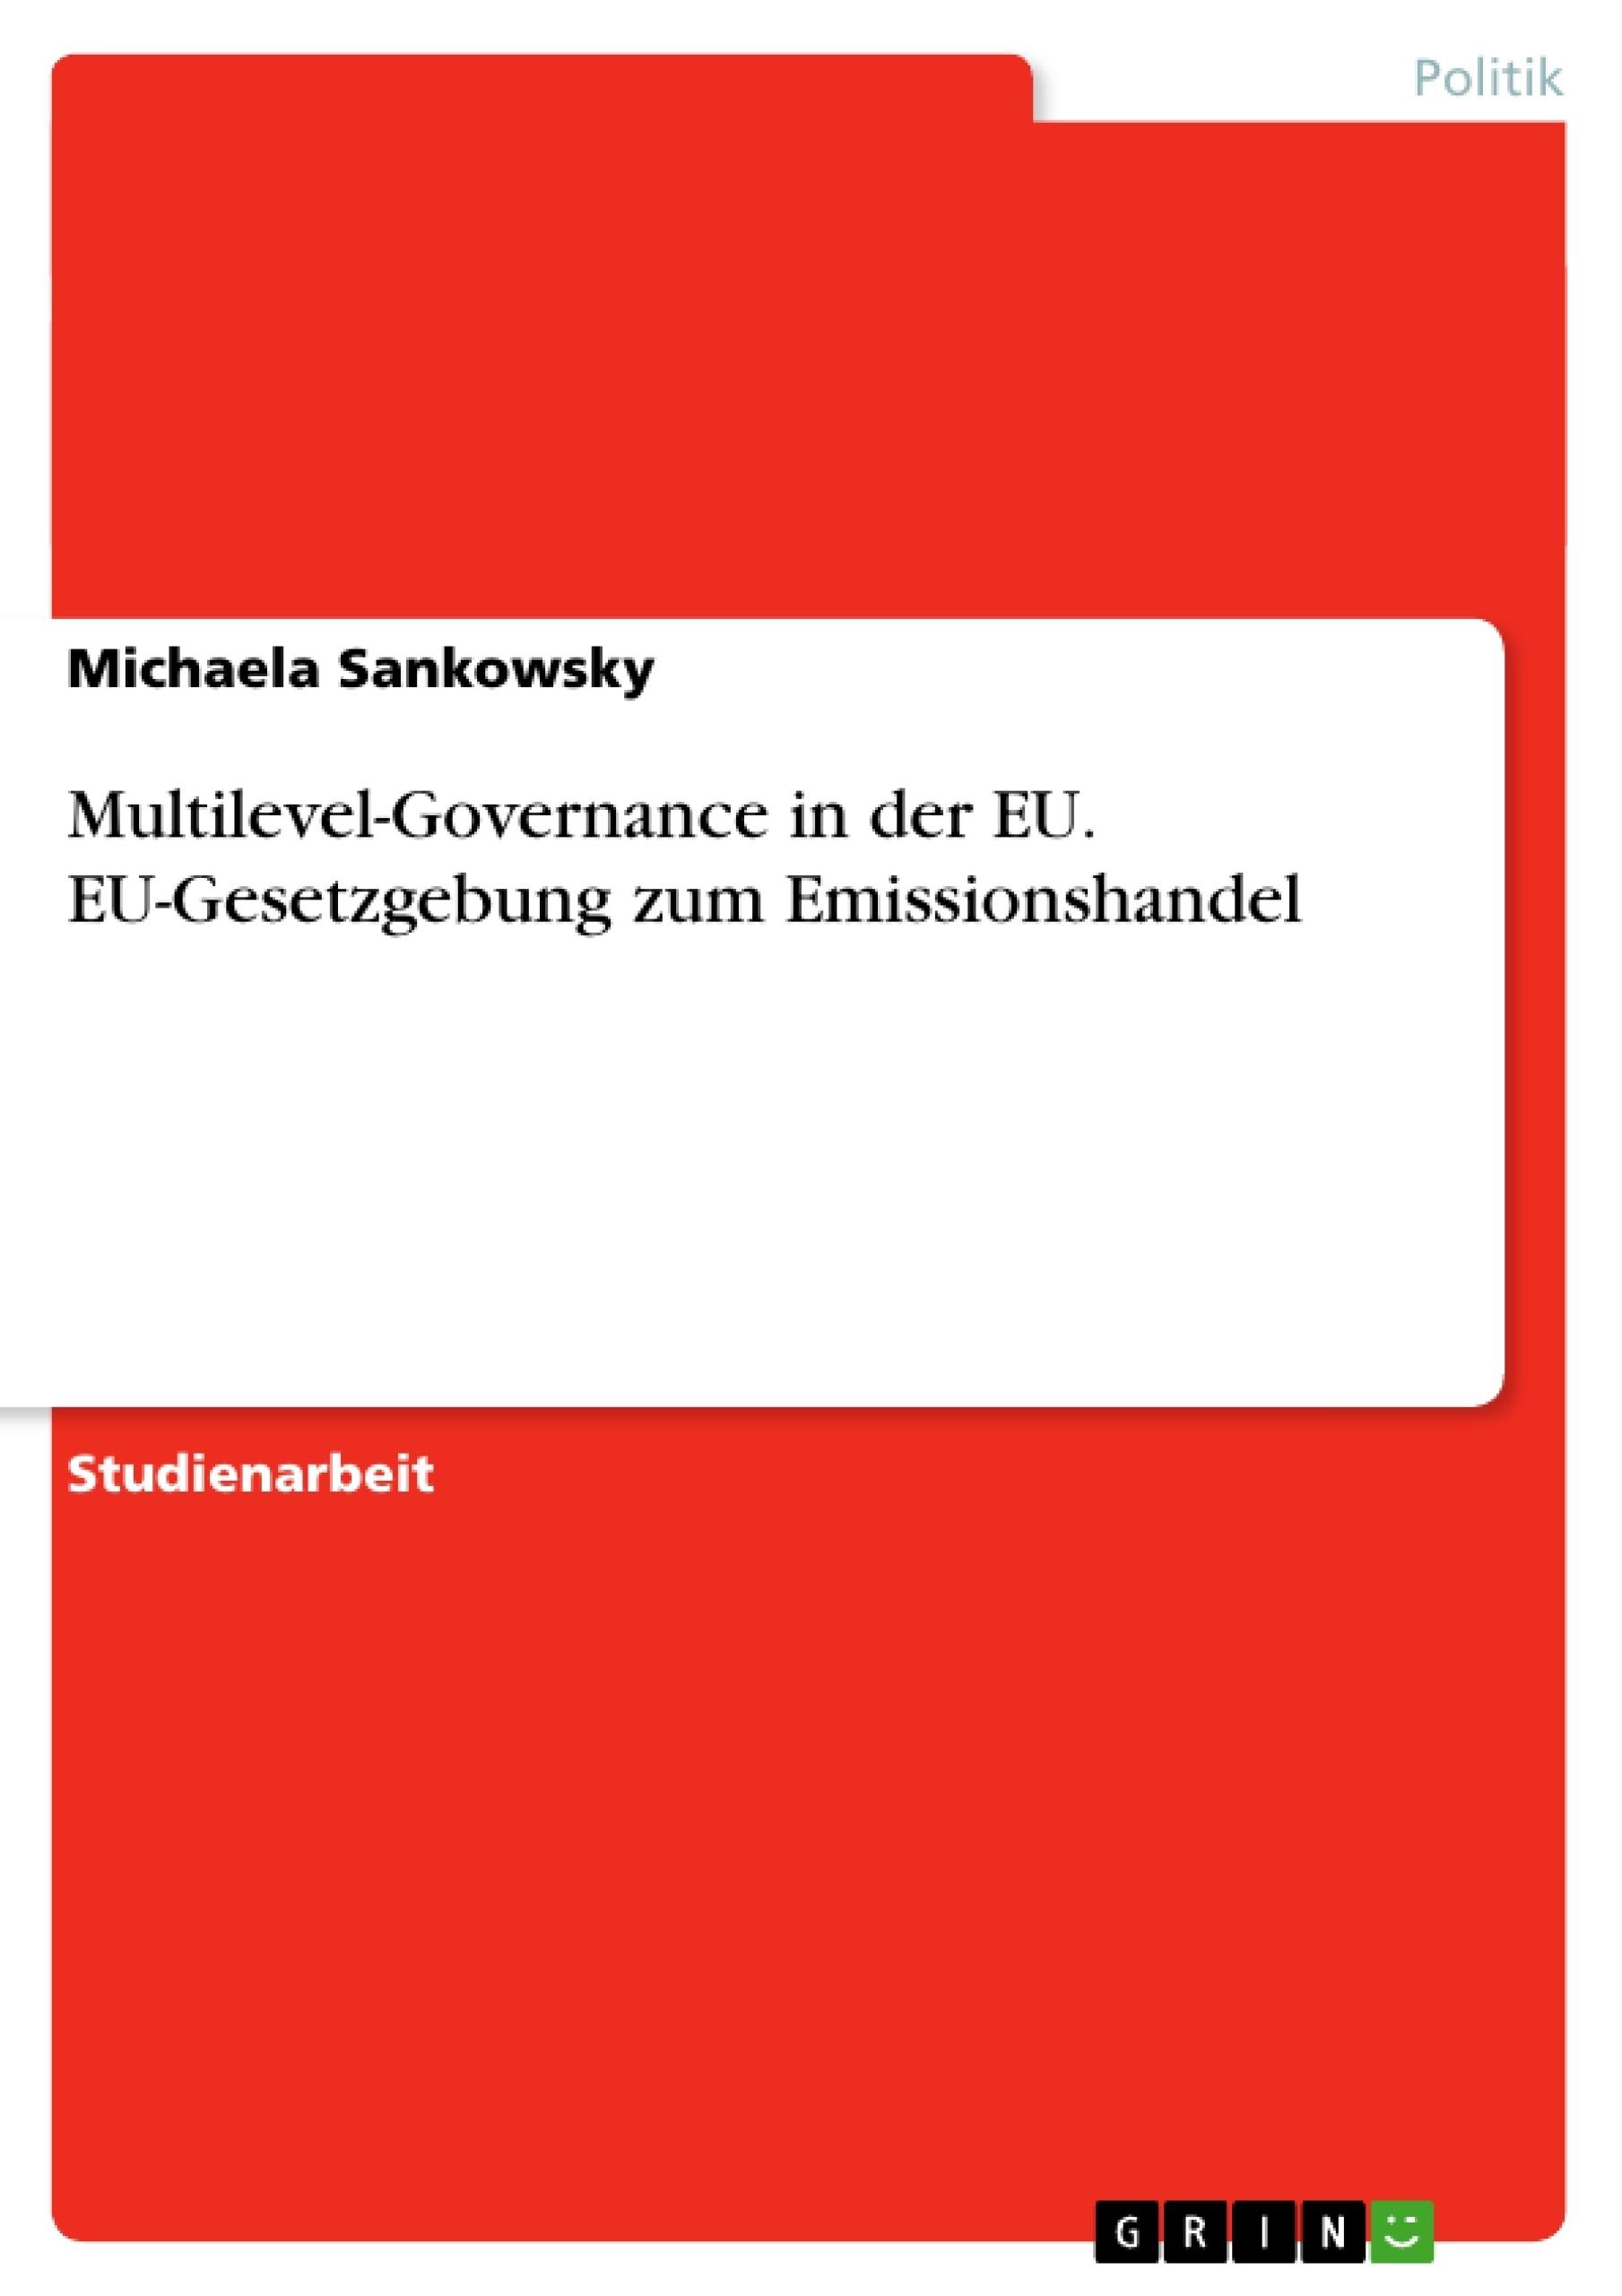 Titel: Multilevel-Governance in der EU. EU-Gesetzgebung zum Emissionshandel